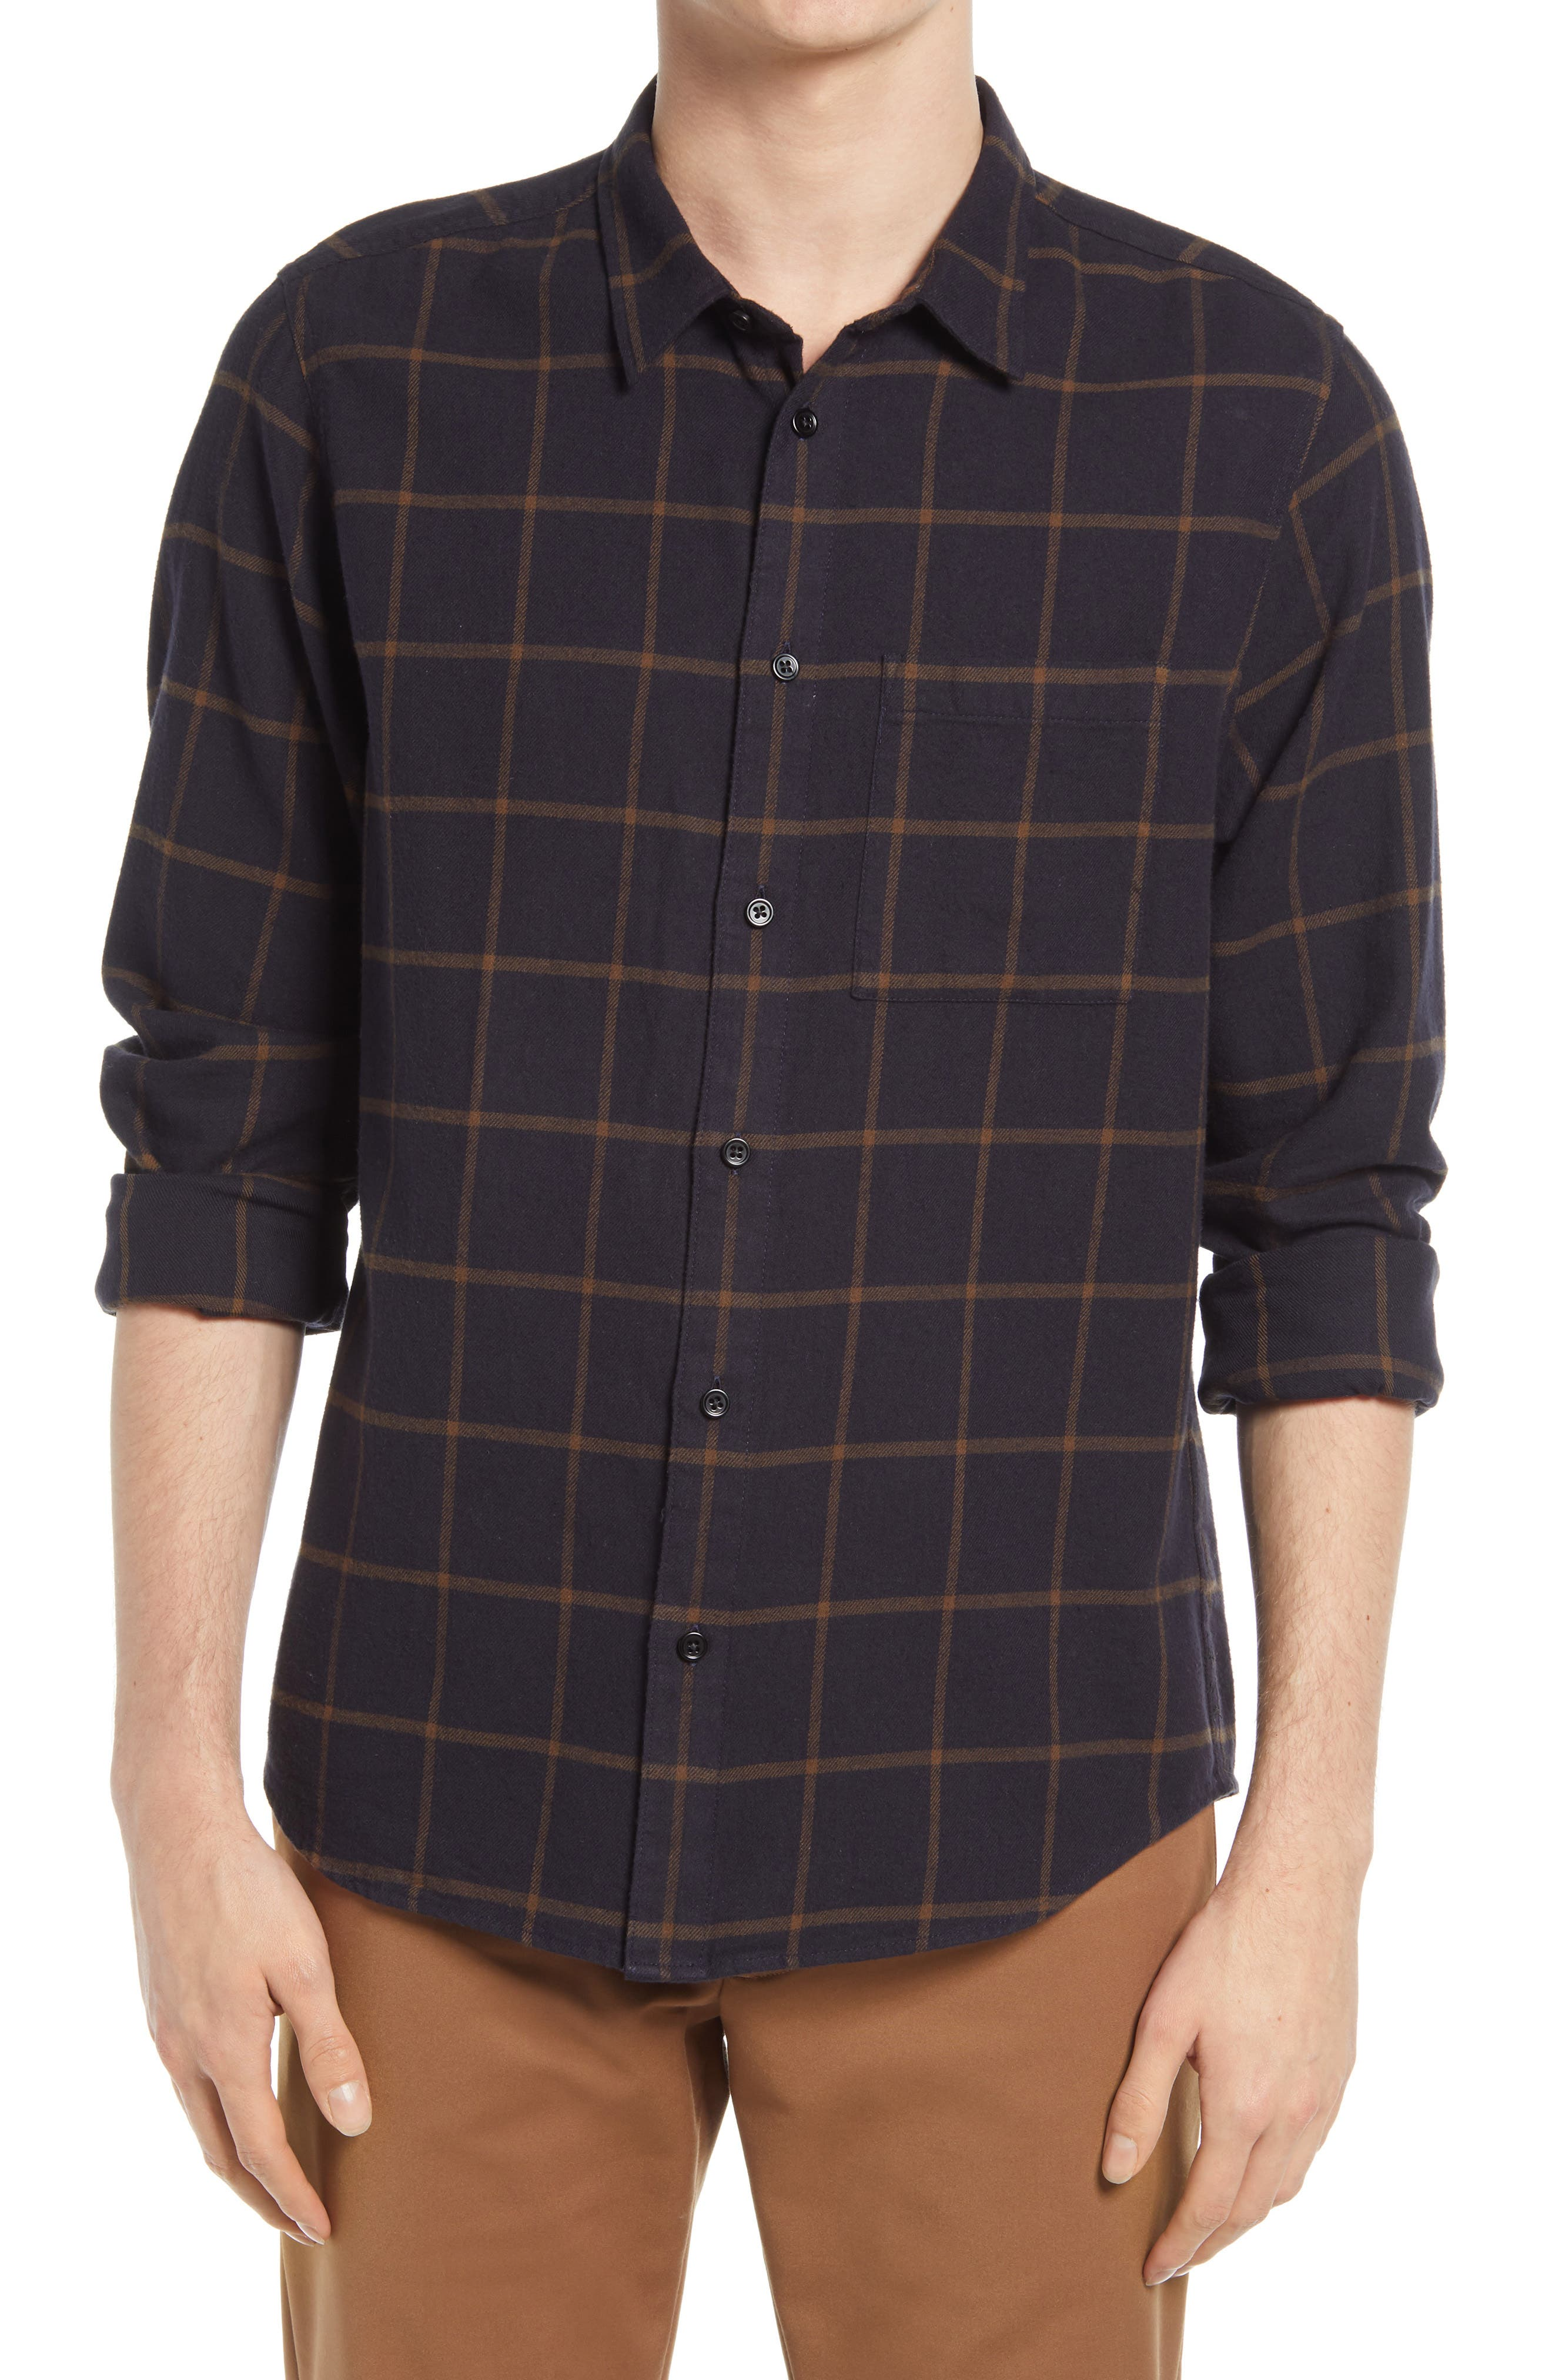 PLAID long Sleeve Checked Flannel Shirt  Men chest pocket shirt  Buttoned up shirt Board Grunge Gentleman Bearded manSize Small to Medium